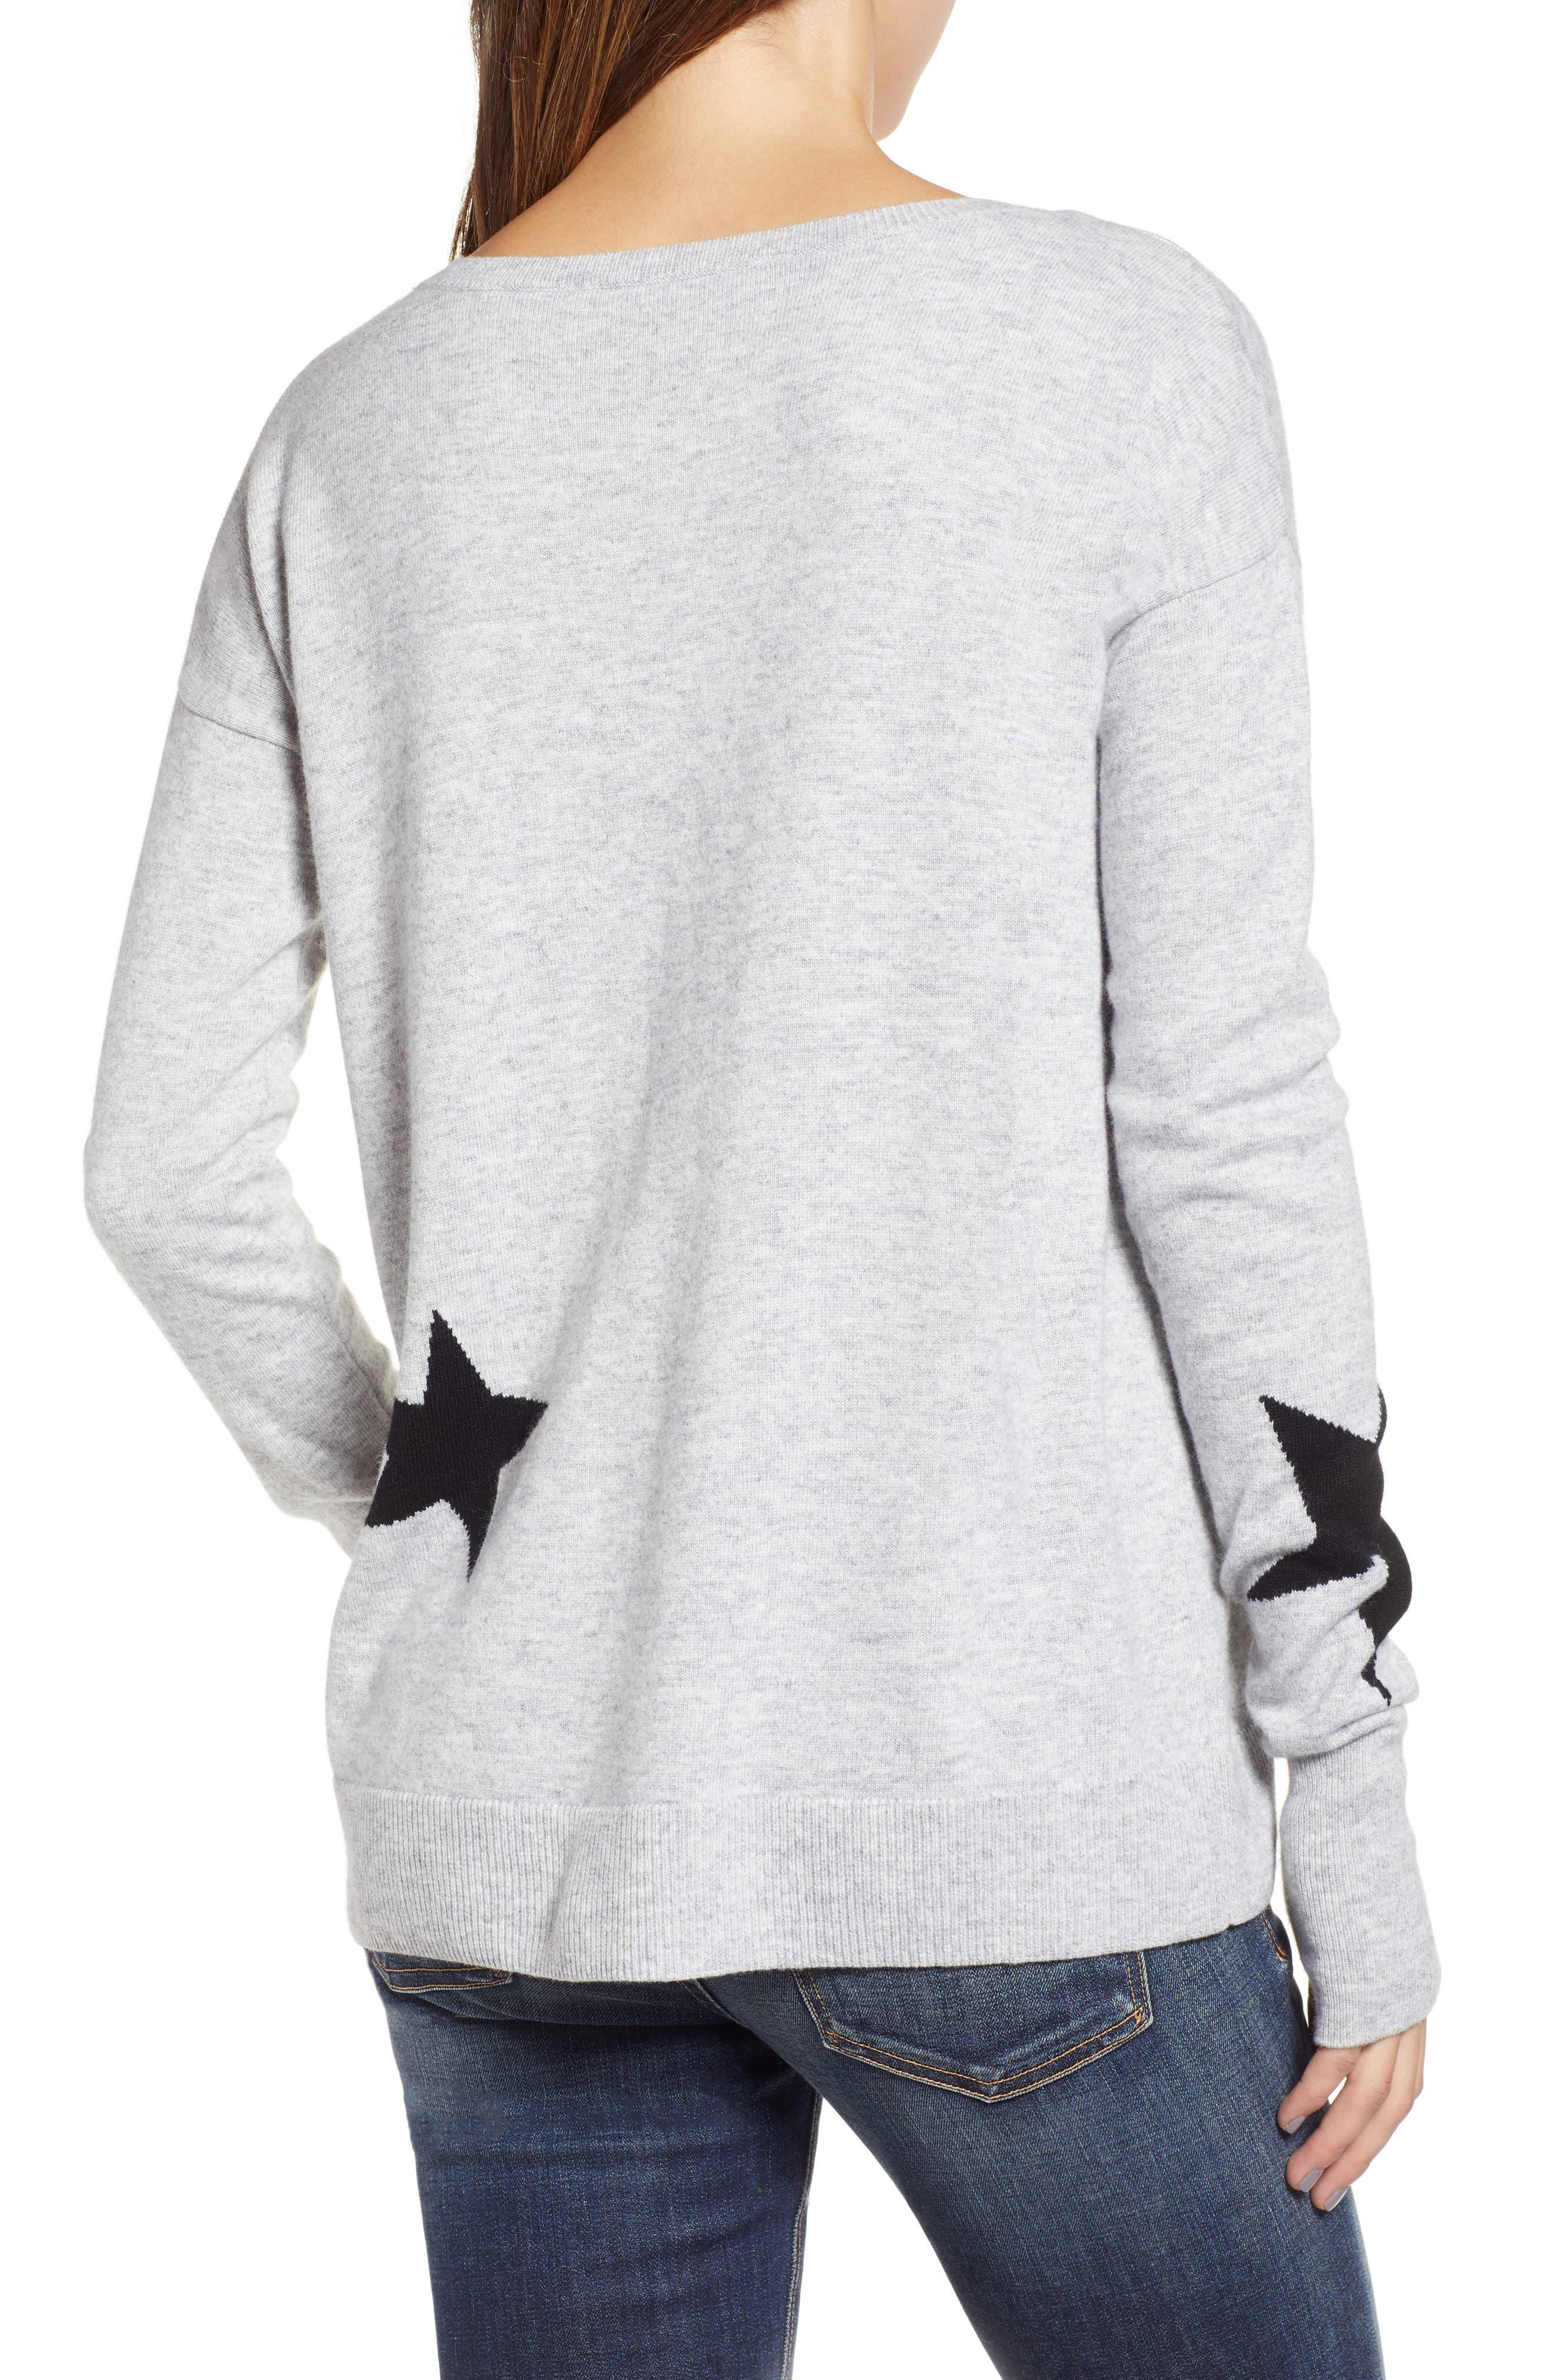 Star Intarsia V-Neck Sweater,                             Alternate thumbnail 2, color,                             HEATHER GREY